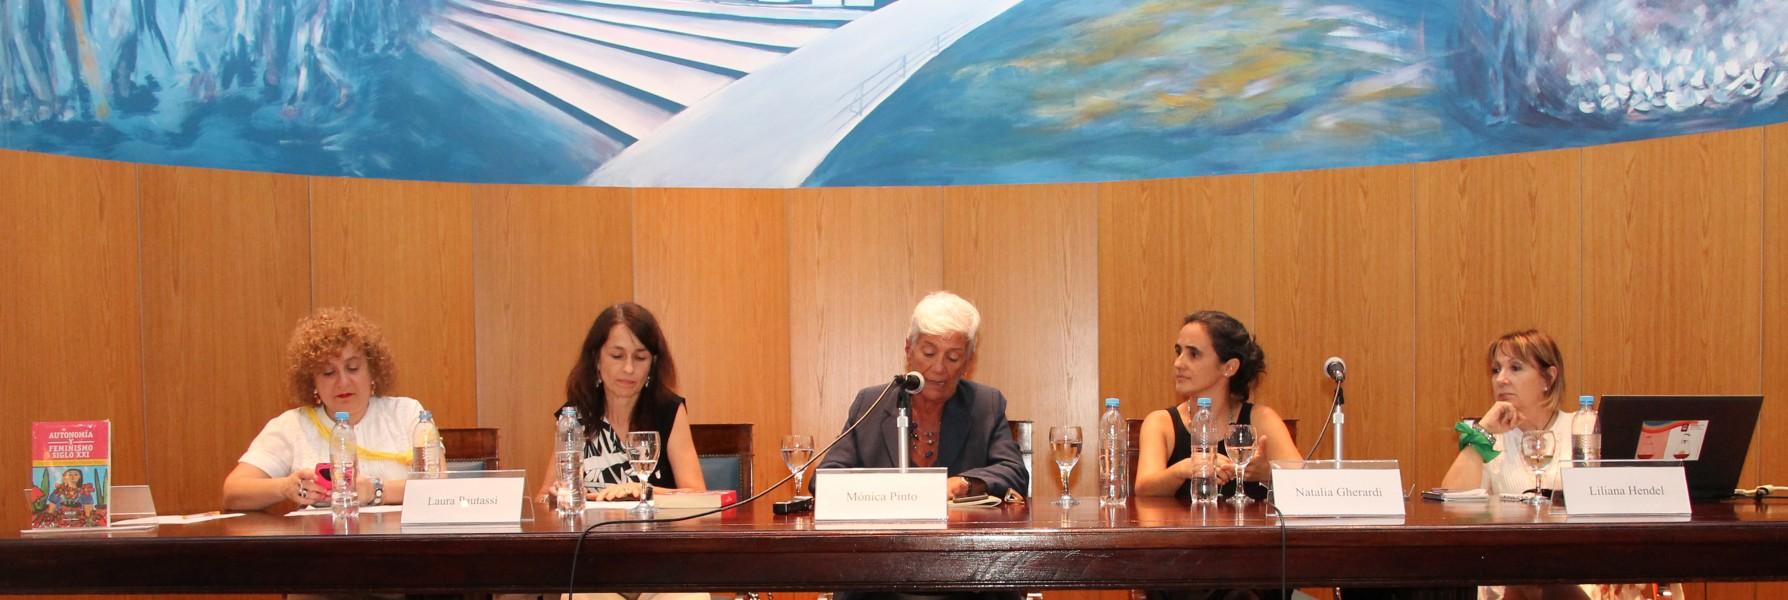 Patricia Gómez, Laura Pautassi, Mónica Pinto, Natalia Gherardi y Liliana Hendel